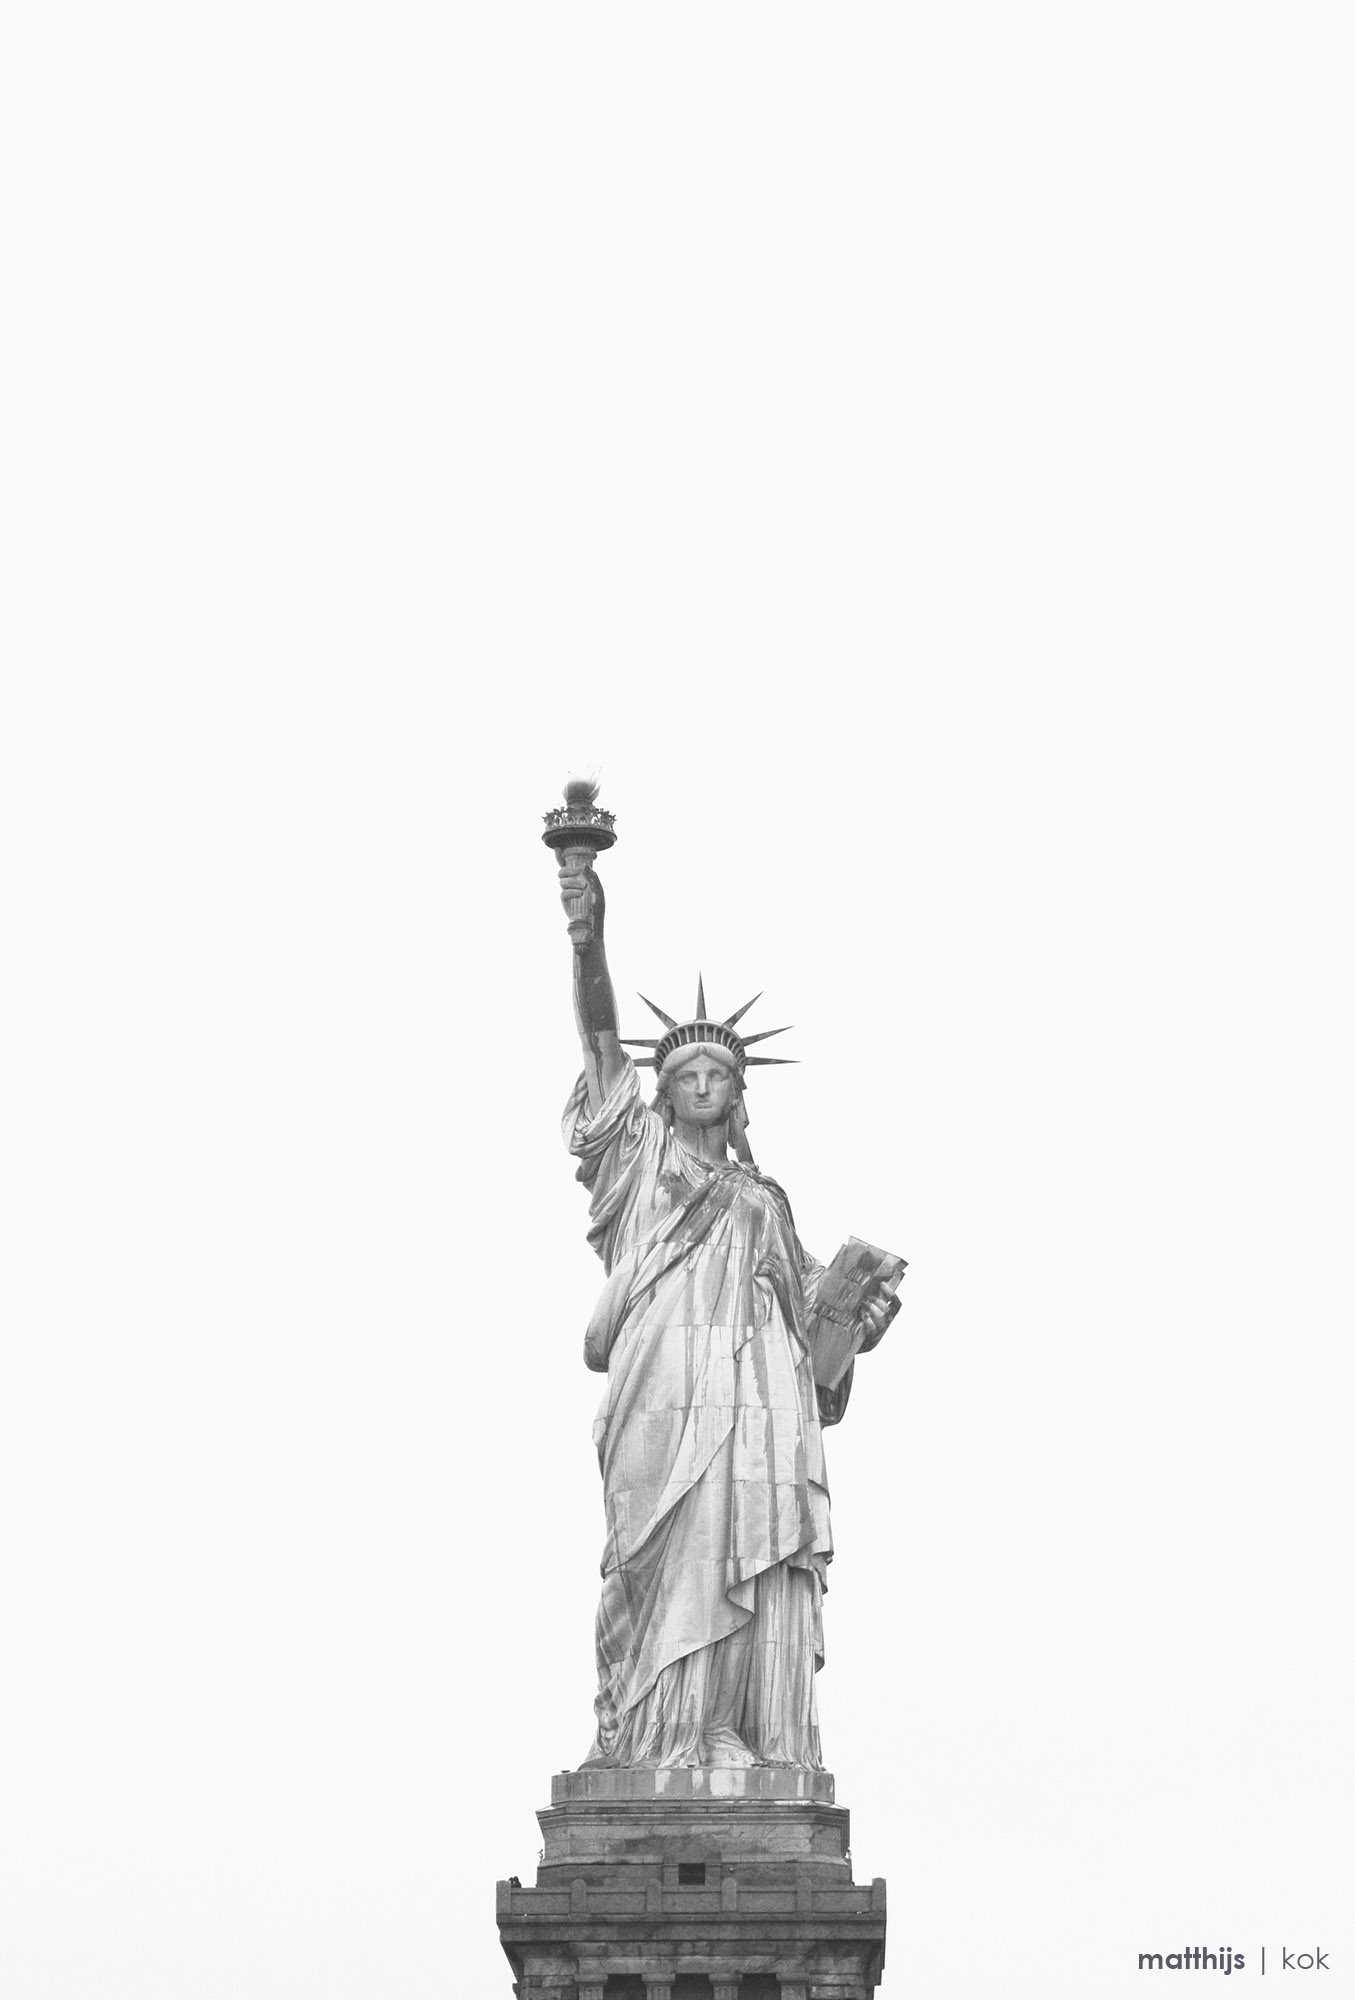 Statue of Liberty, New York | Photo by Matthijs Kok